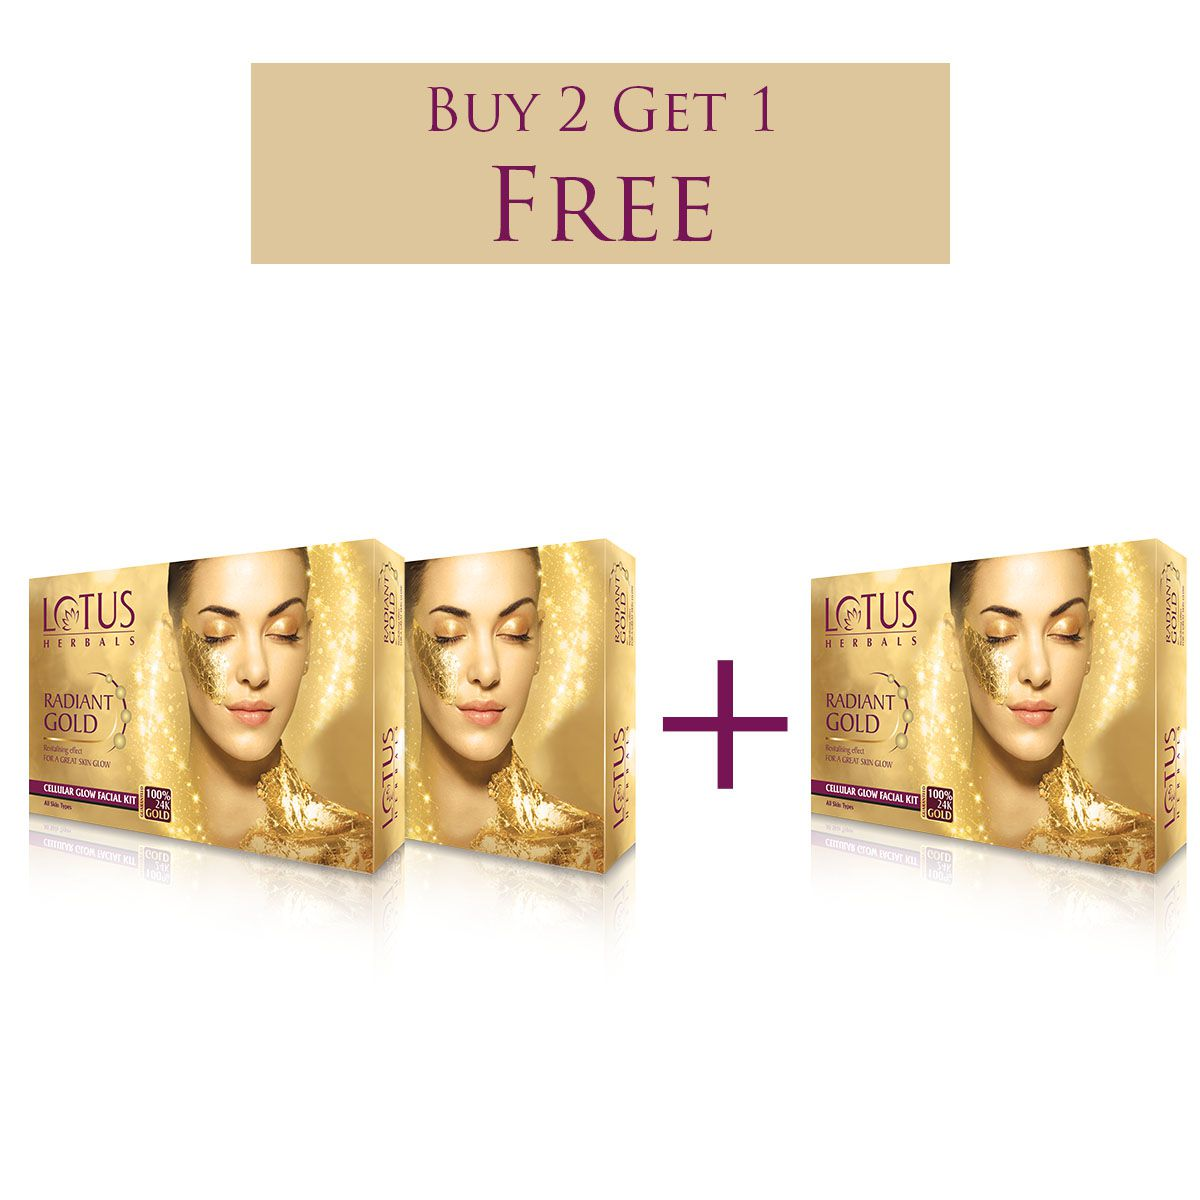 76c483ca22 Buy 2 Get 1 Lotus Herbals Radiant Gold Cellular Glow Facial Kit: Buy Buy 2  Get 1 Lotus Herbals Radiant Gold Cellular Glow Facial Kit at Best Prices in  India ...